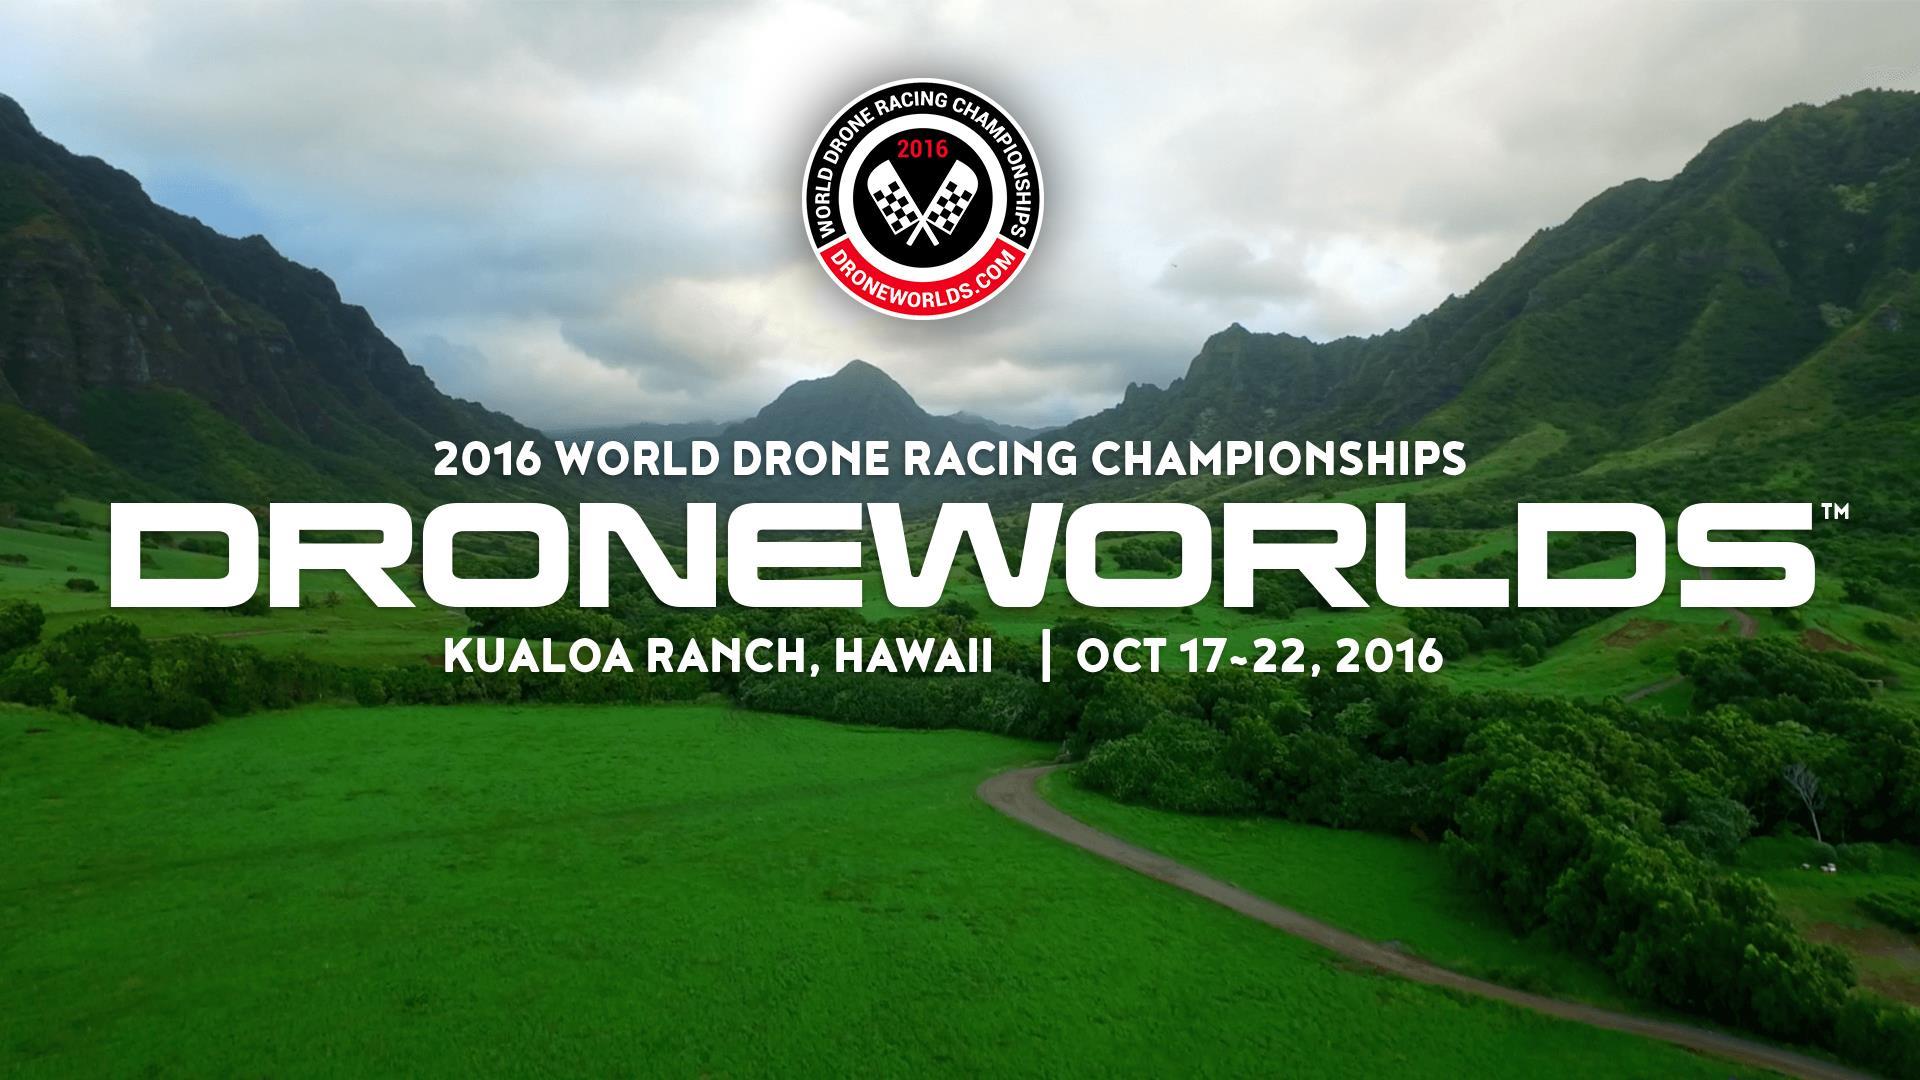 Drone Worlds 2016